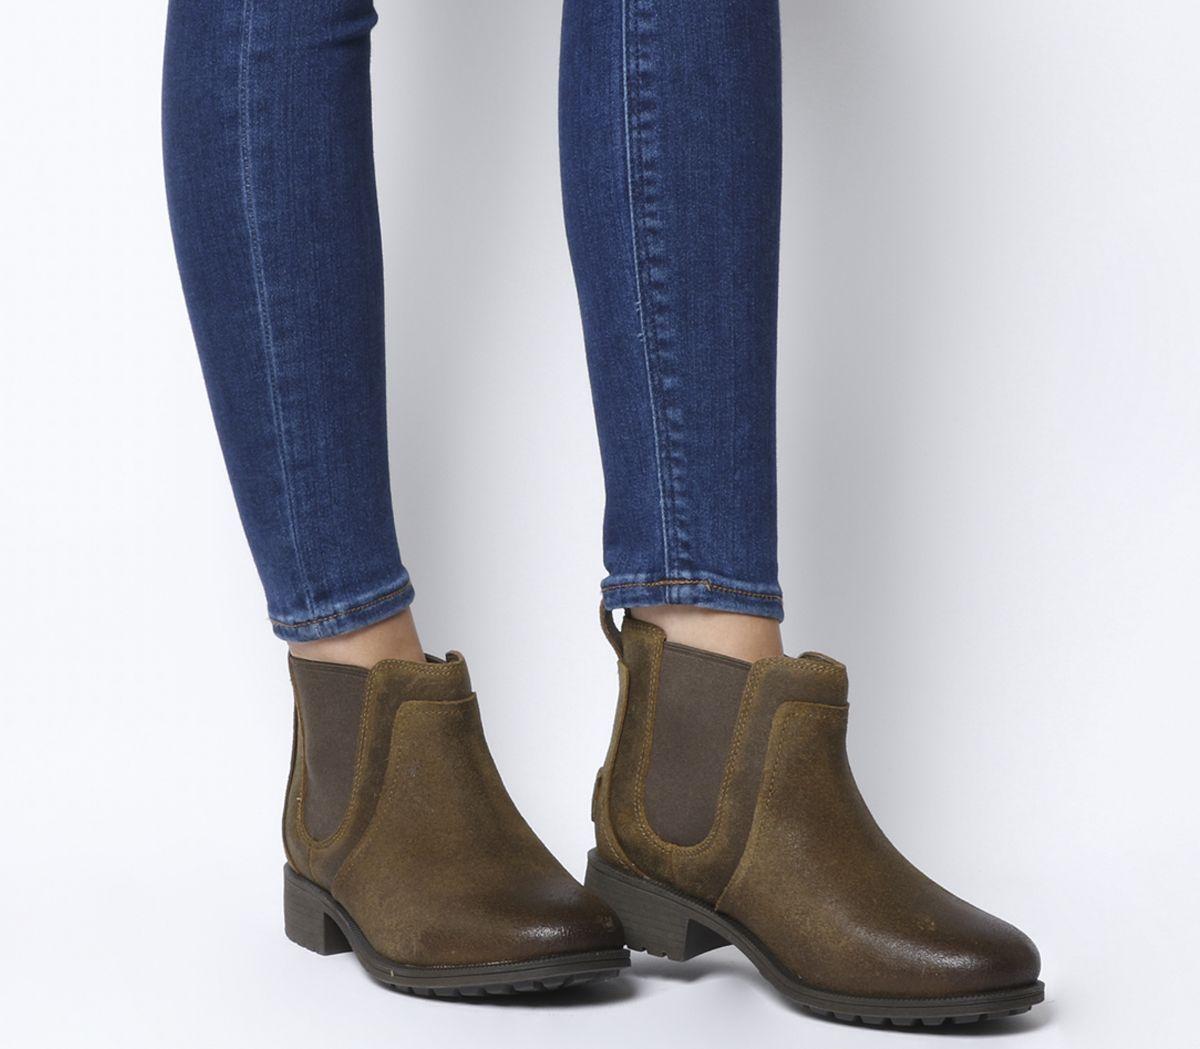 4728be5af97 Bonham Chelsea Boots II